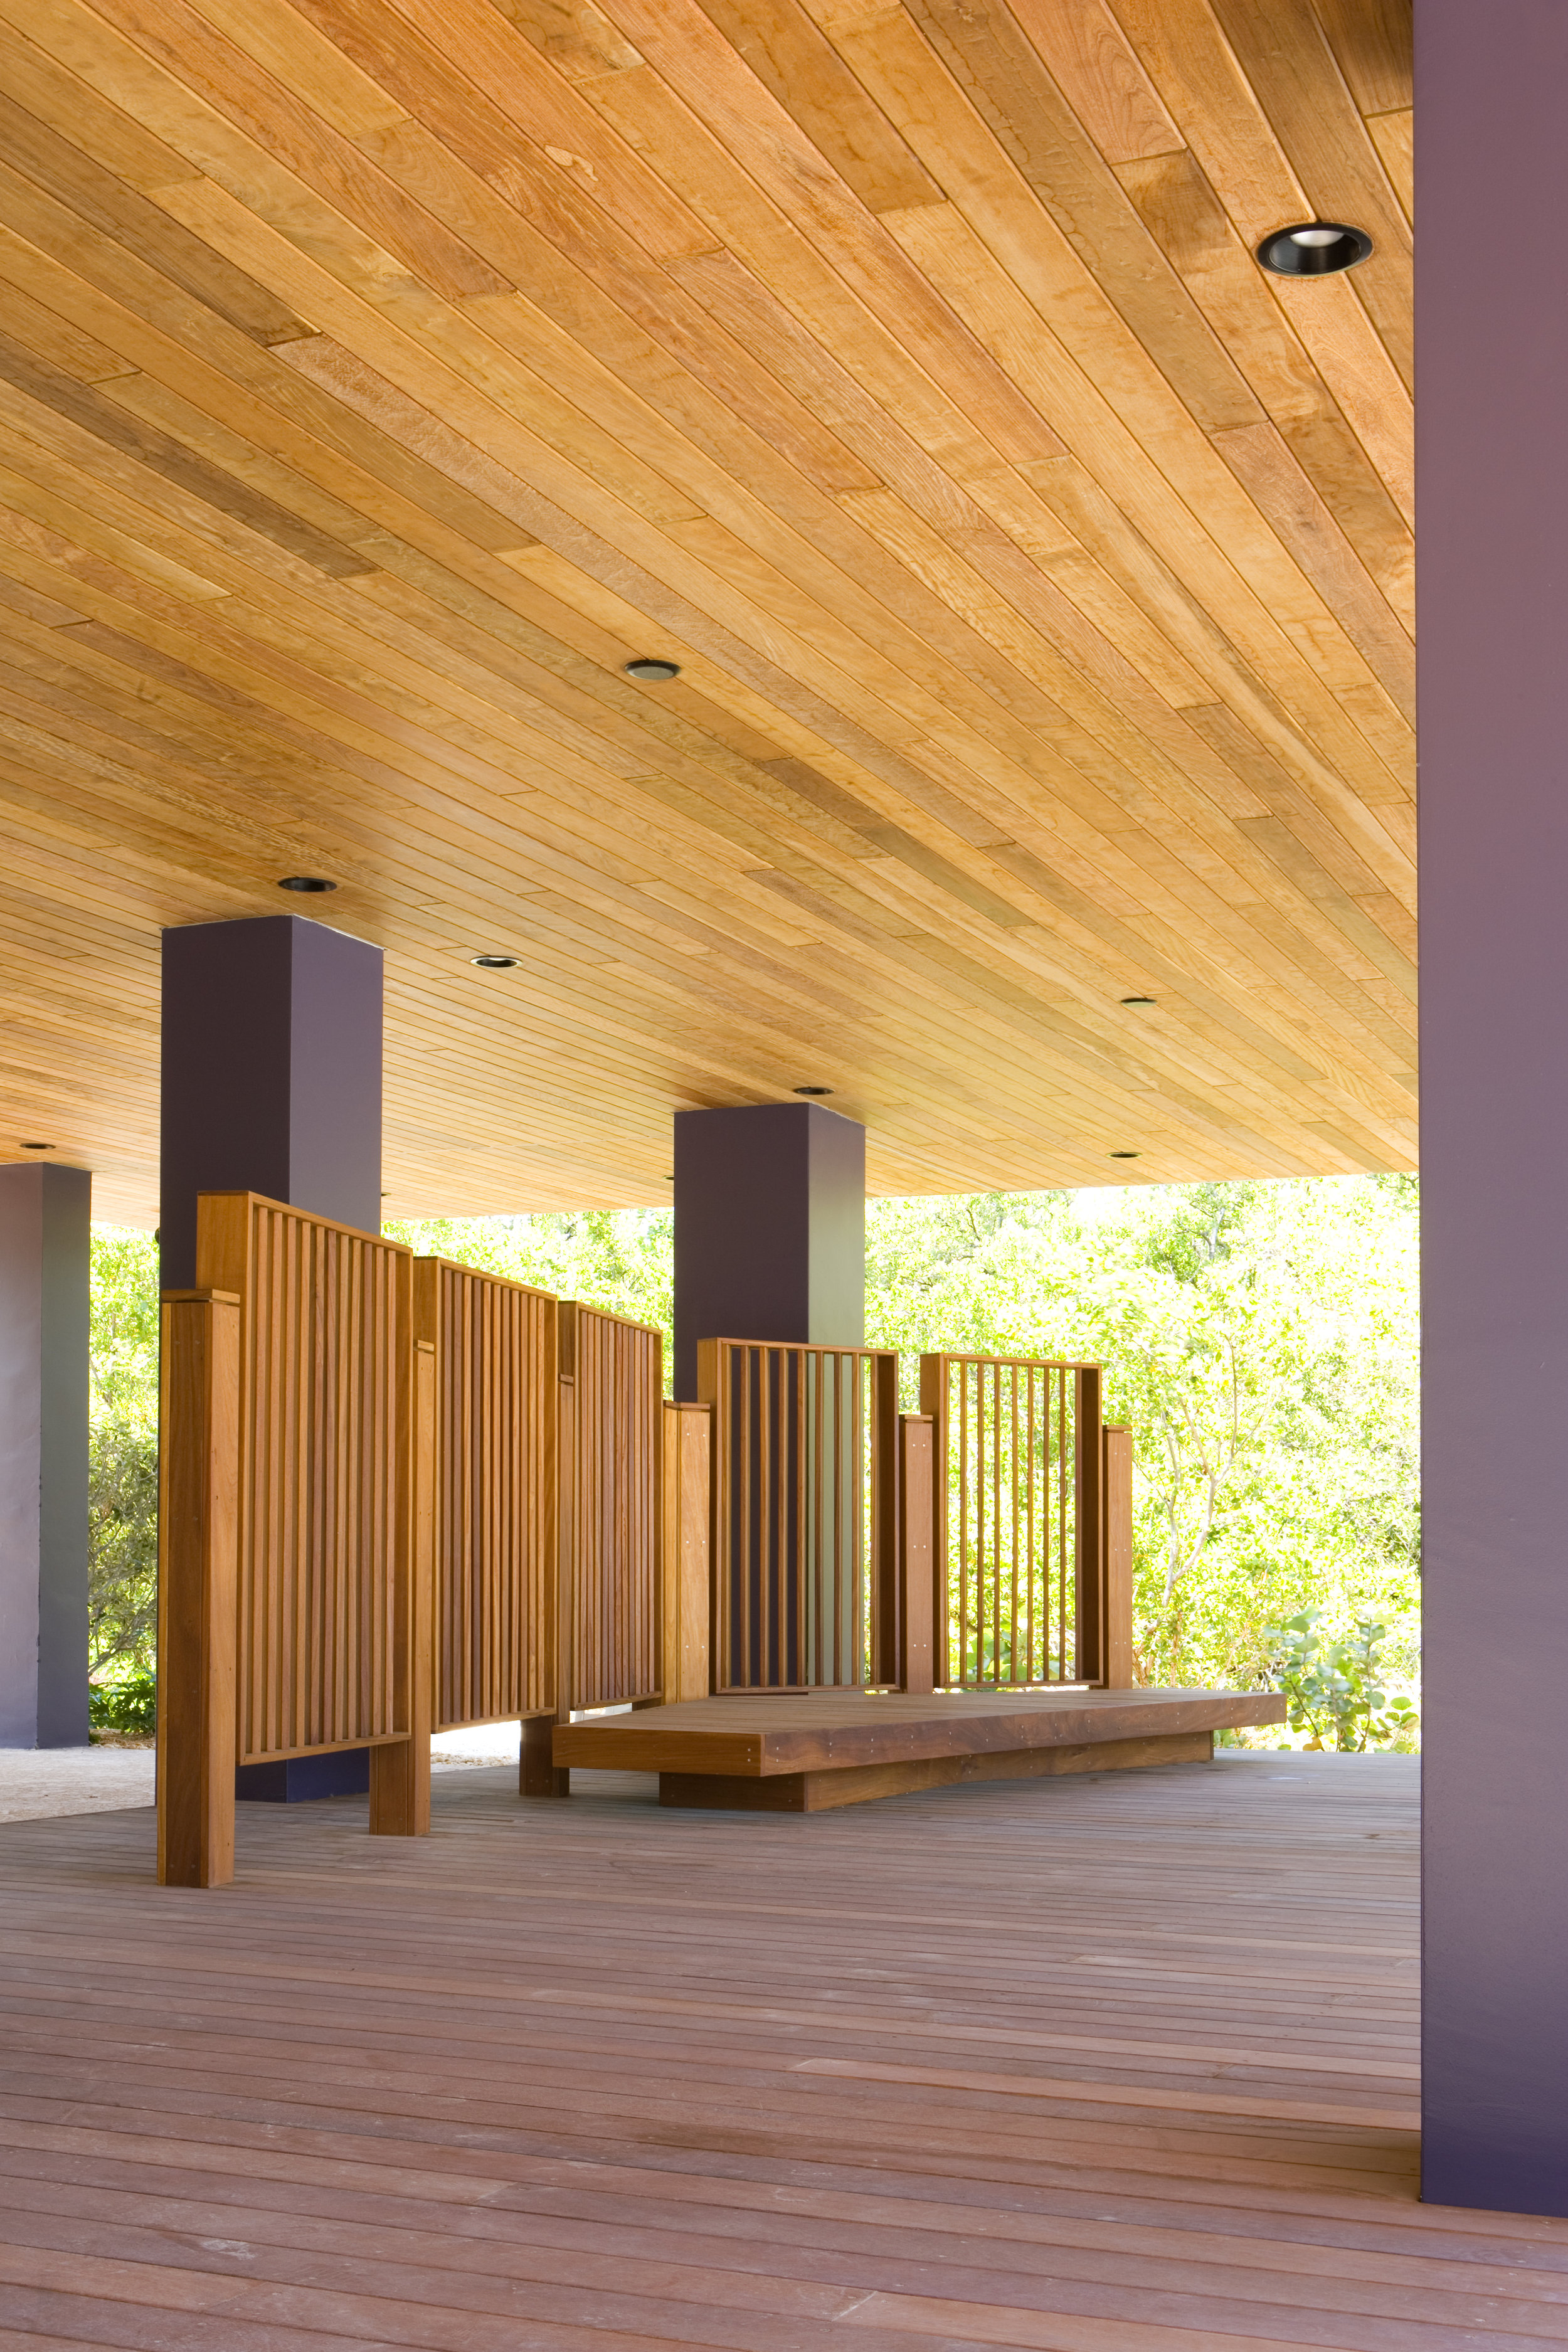 interior-house-tropical-hotel-hospitality_miami_4c.jpg